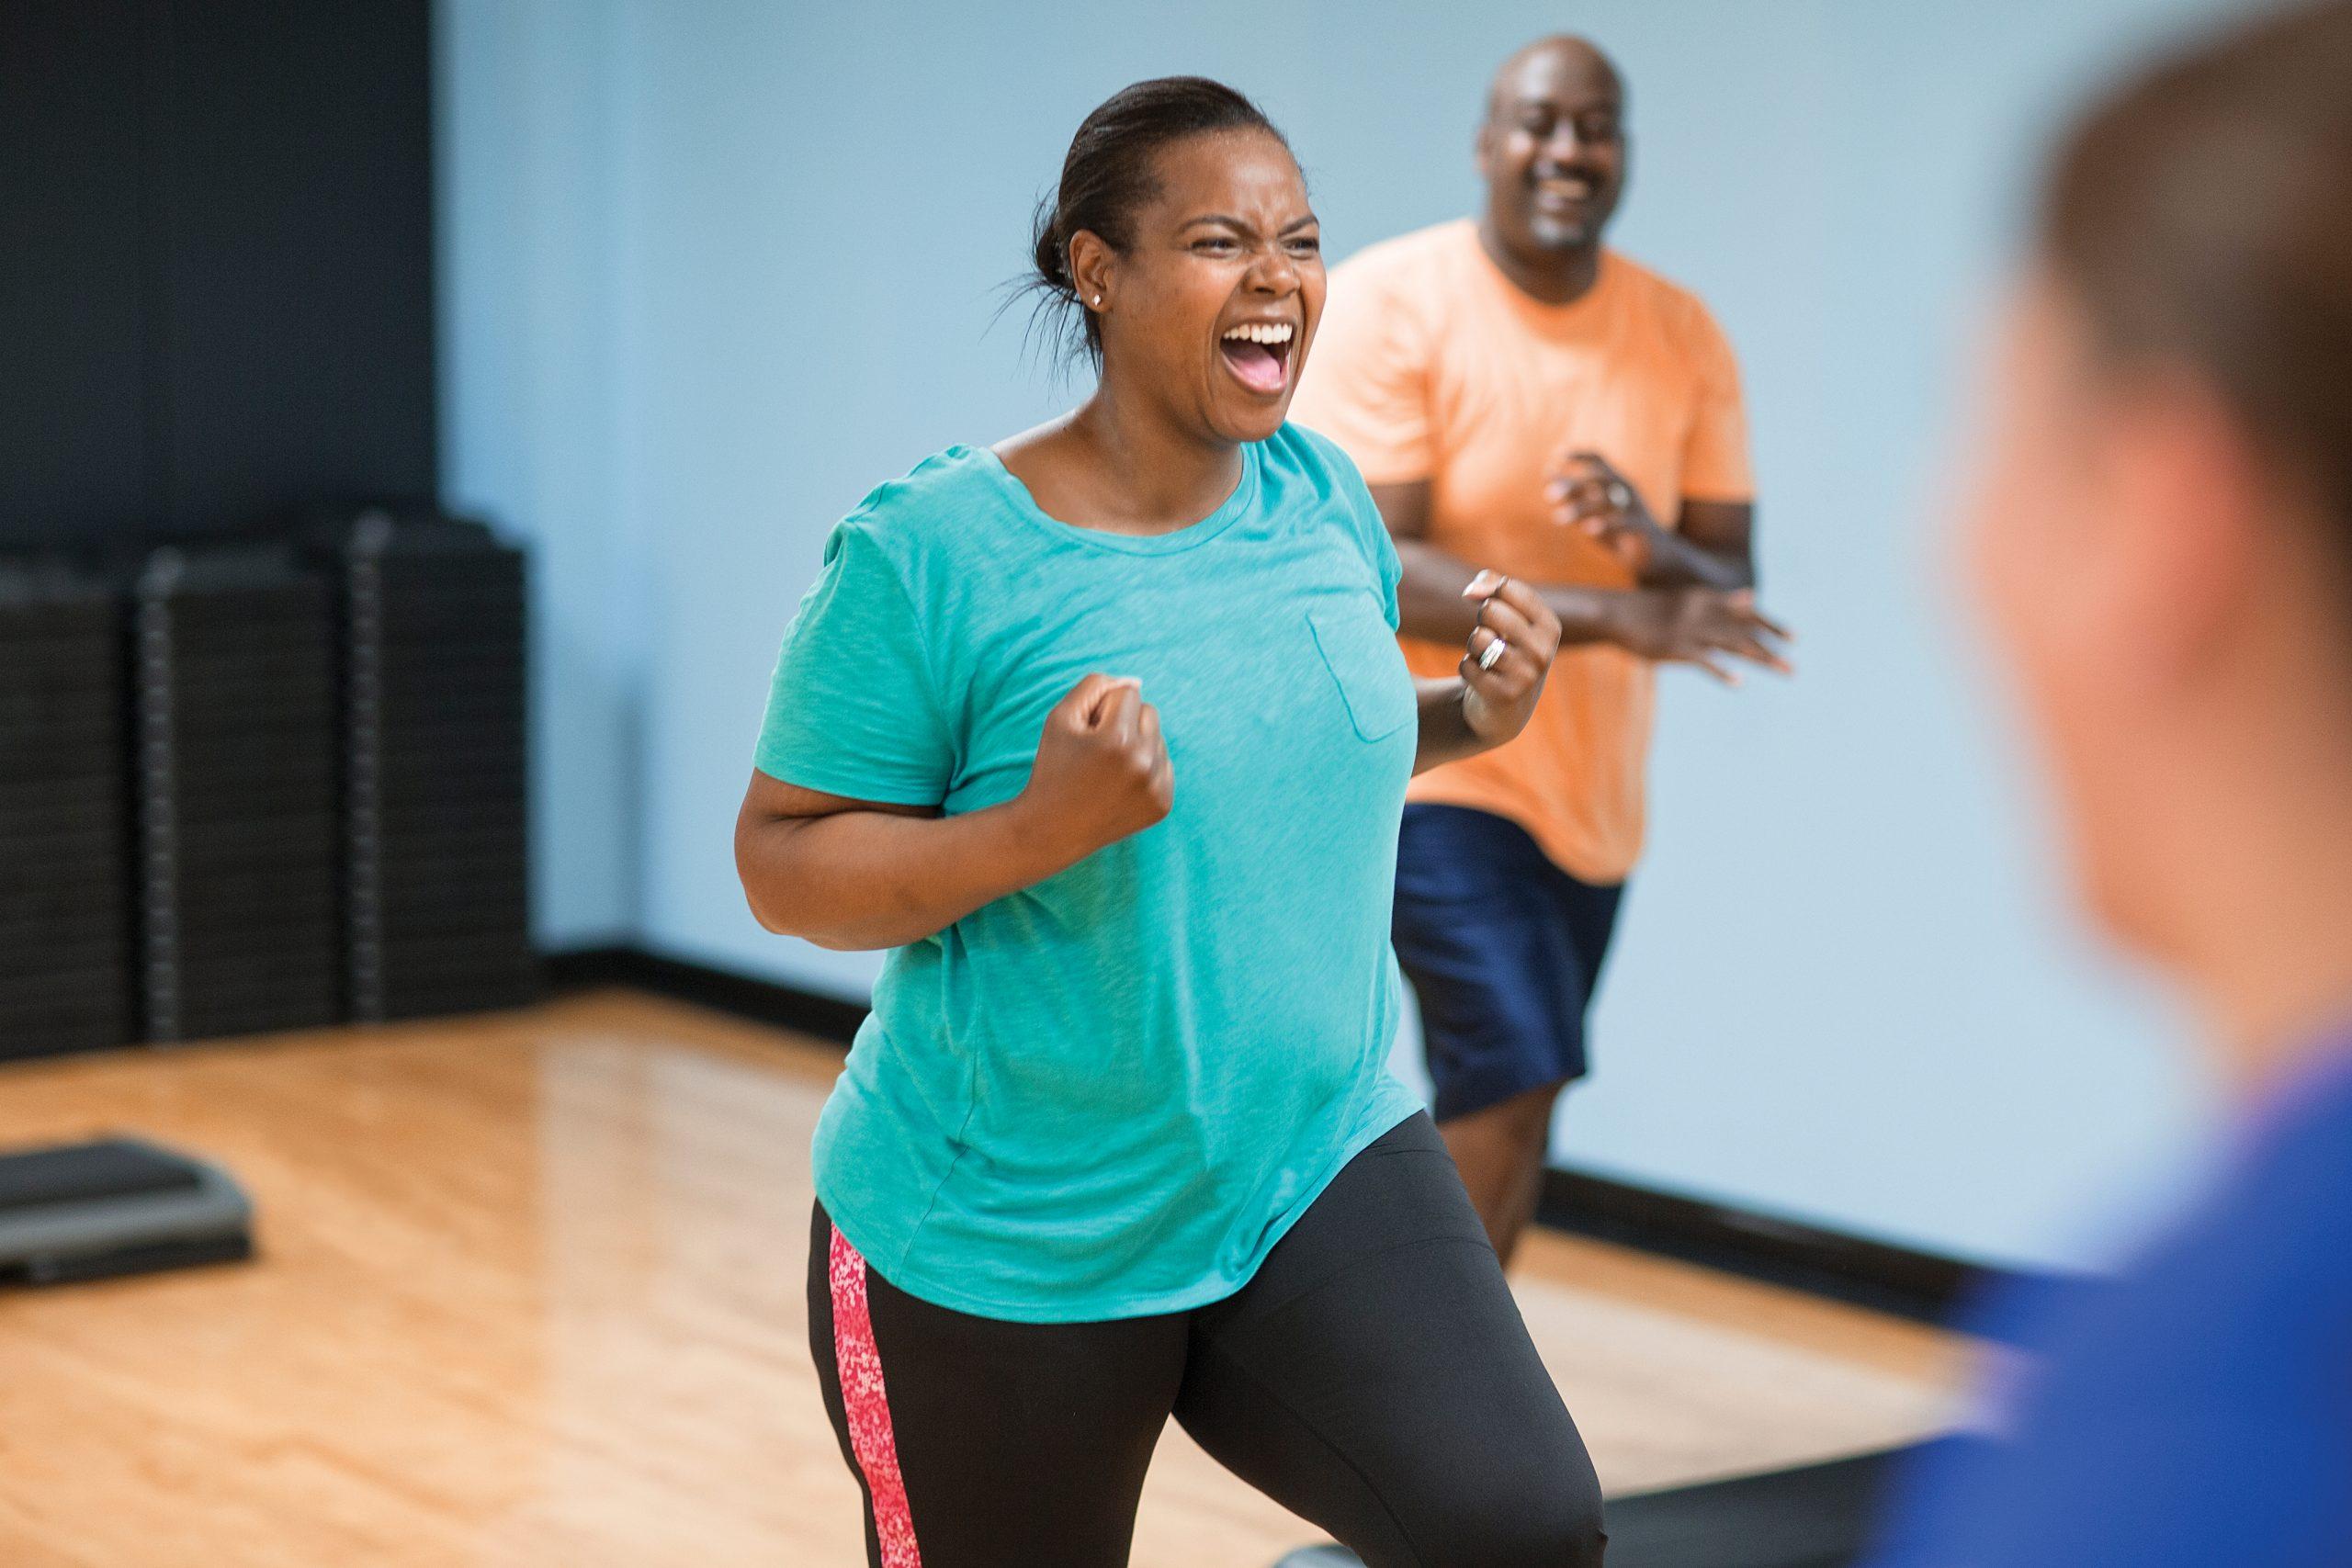 MEMBERS TOGETHER 20/20 PROGRAM YMCA Blog Post